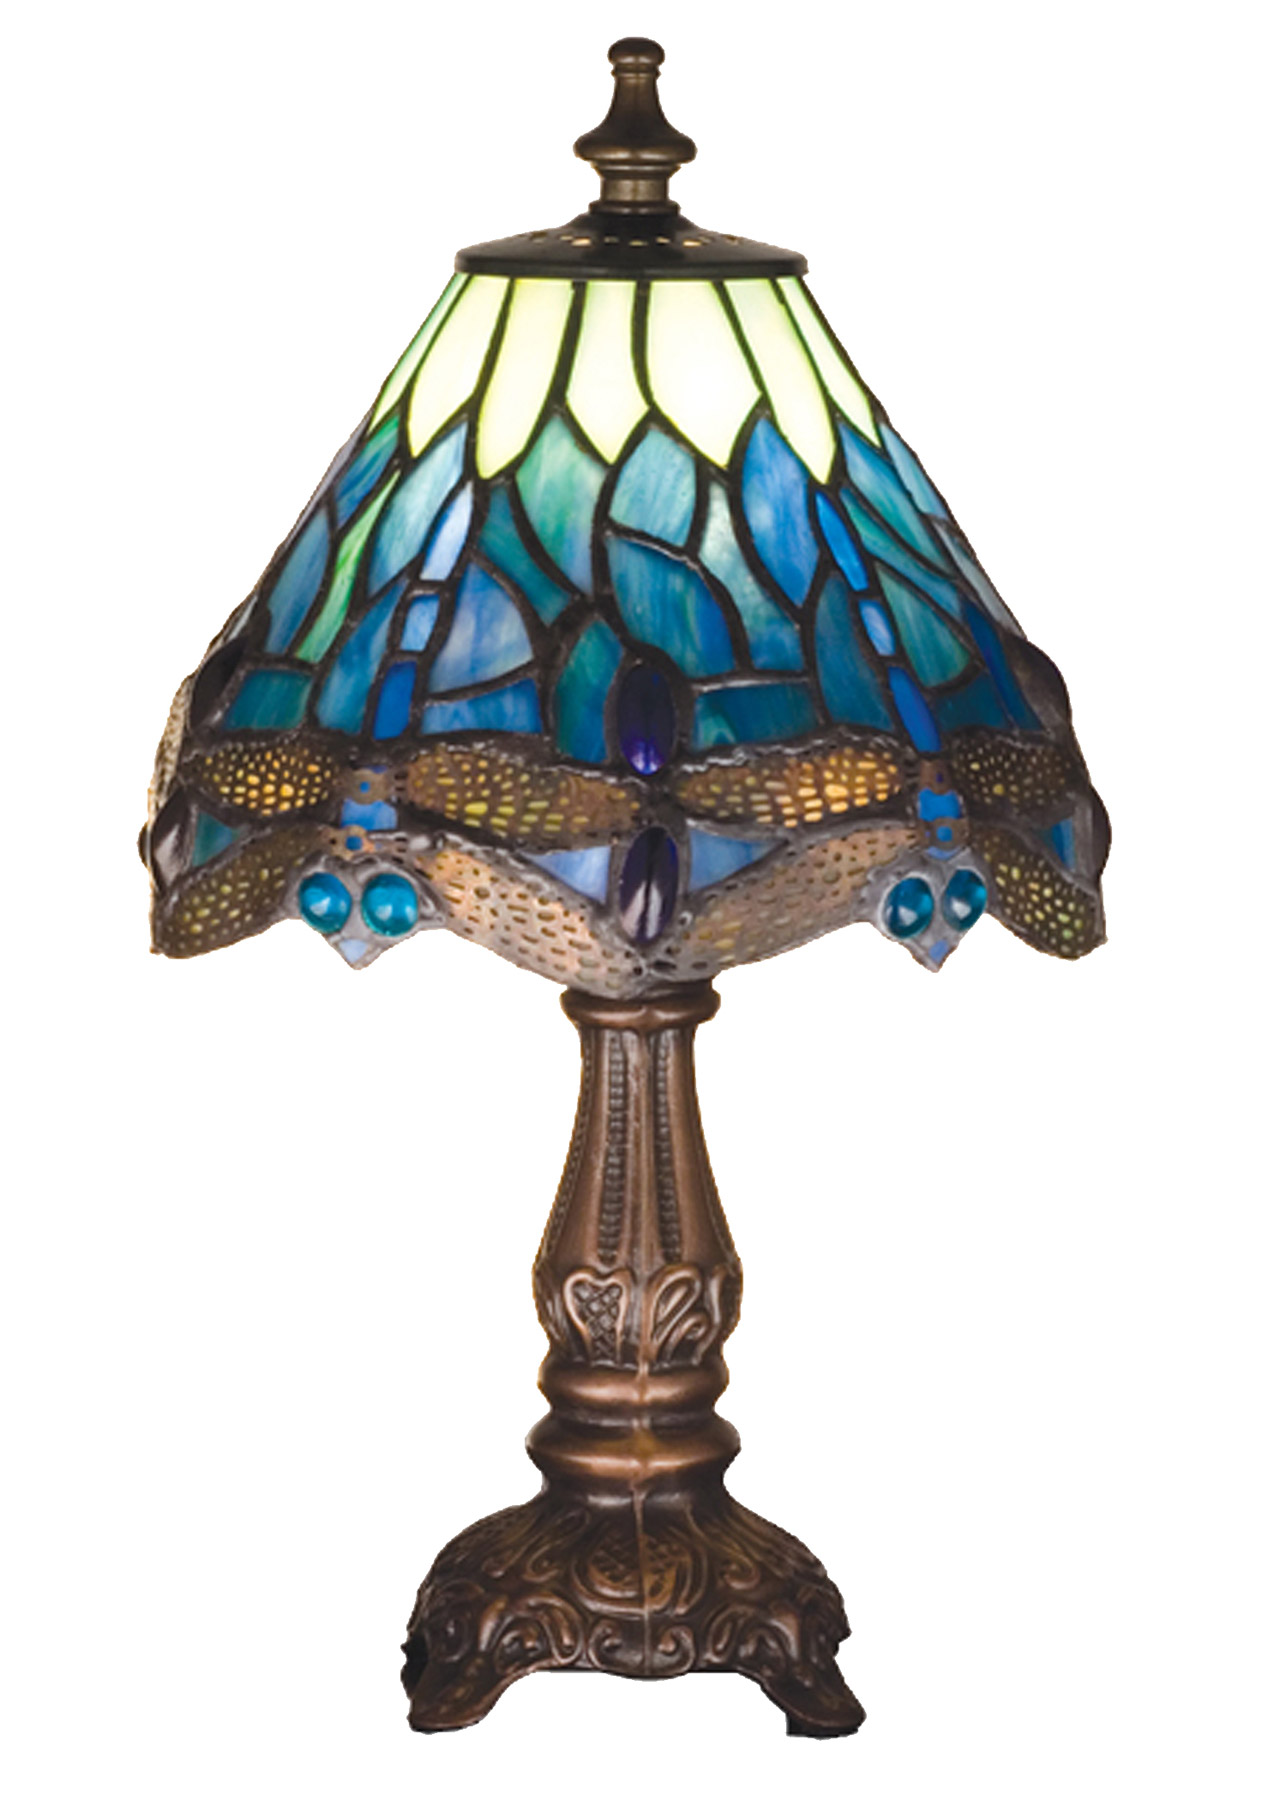 Meyda 26597 Tiffany Dragonfly Mini Accent Lamp